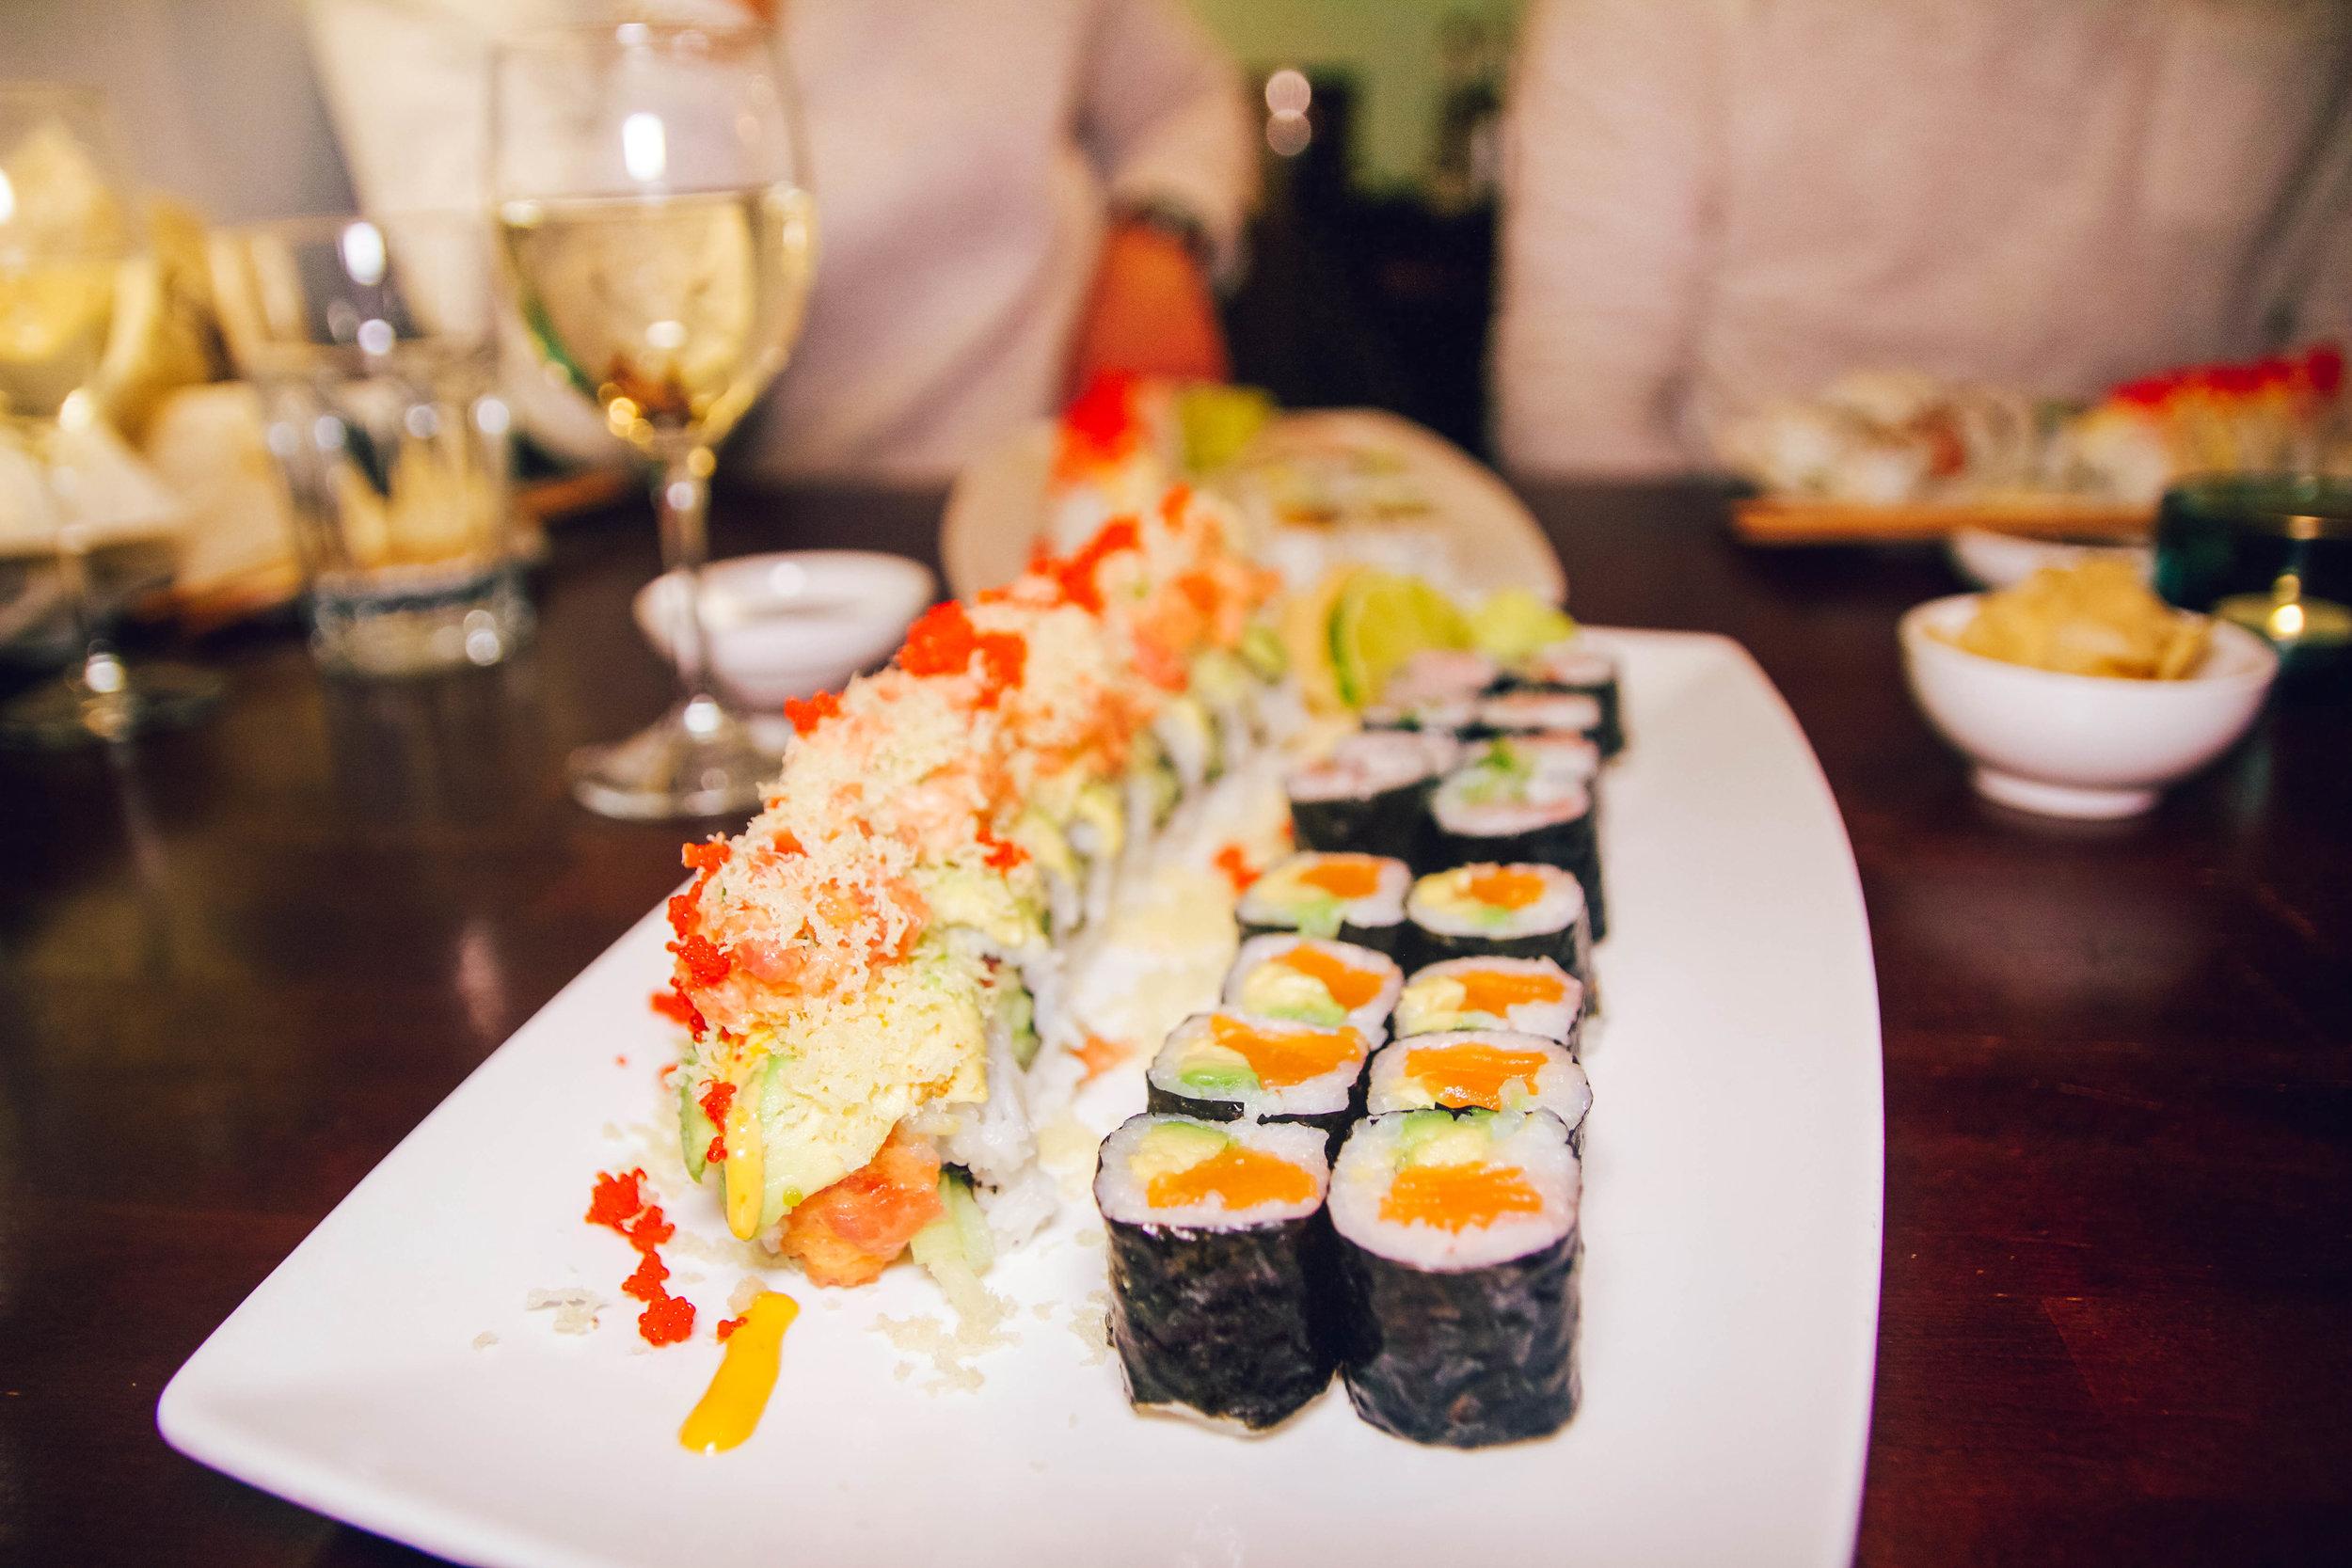 Hikari Roll + Salmon Avocado